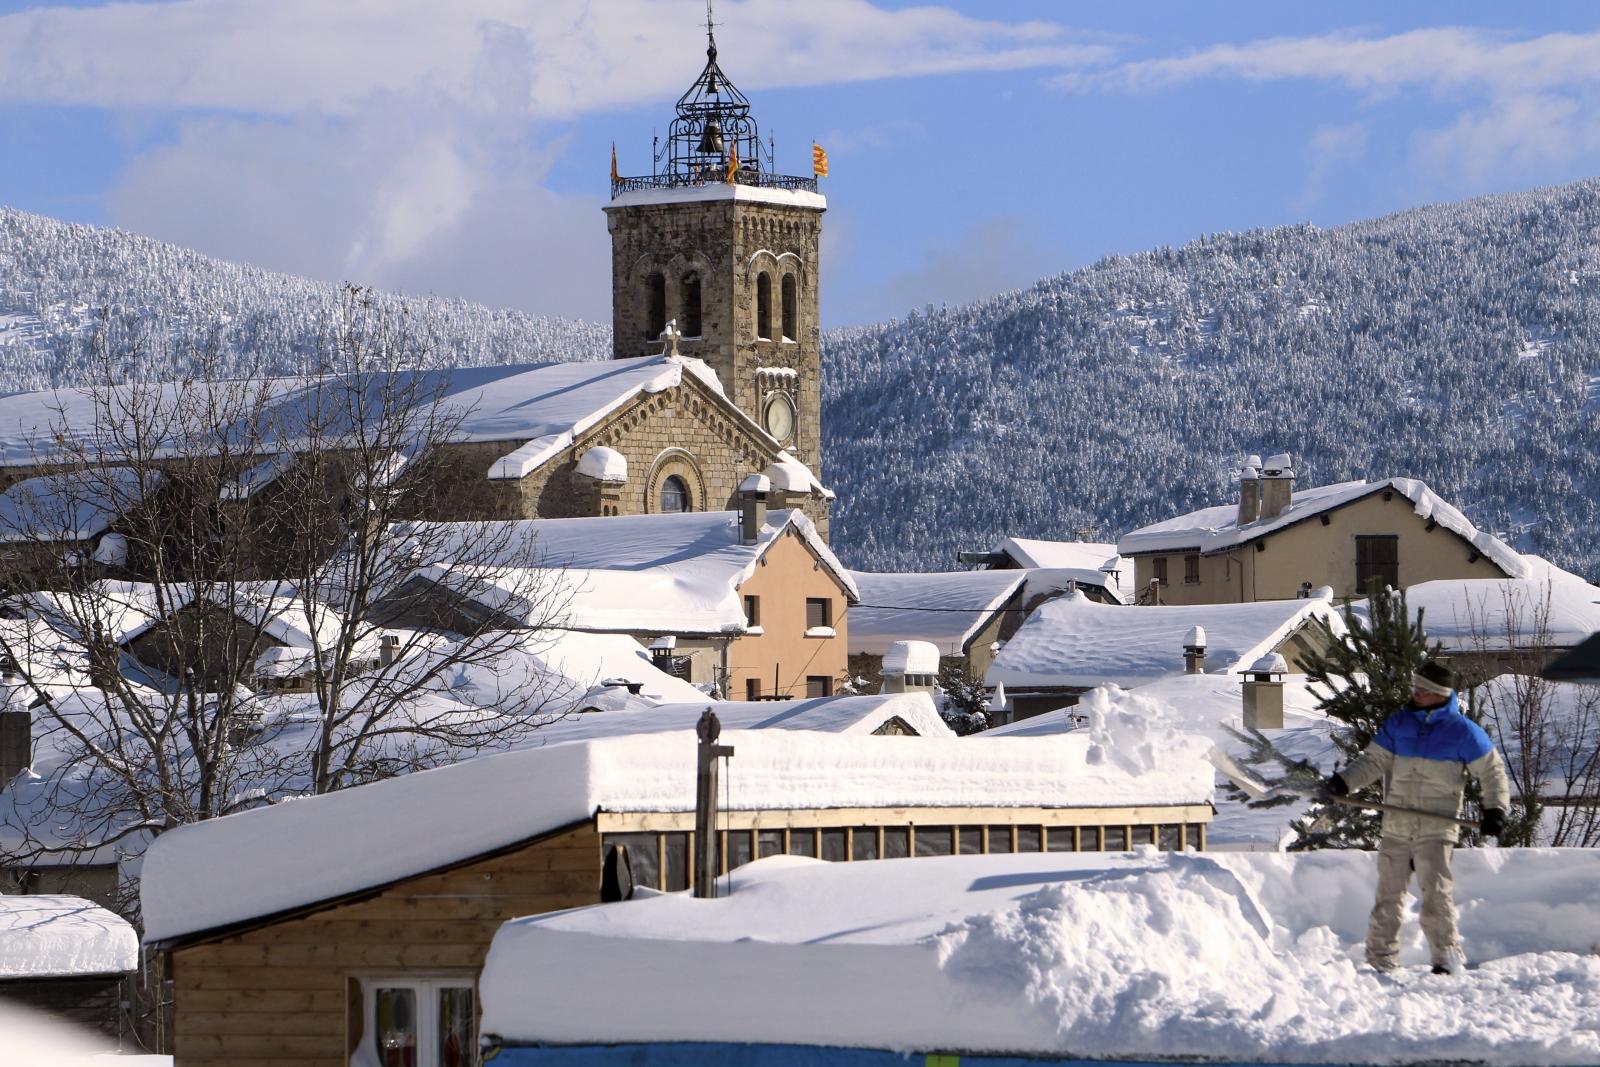 Les Angles Pyrenees ski resort France